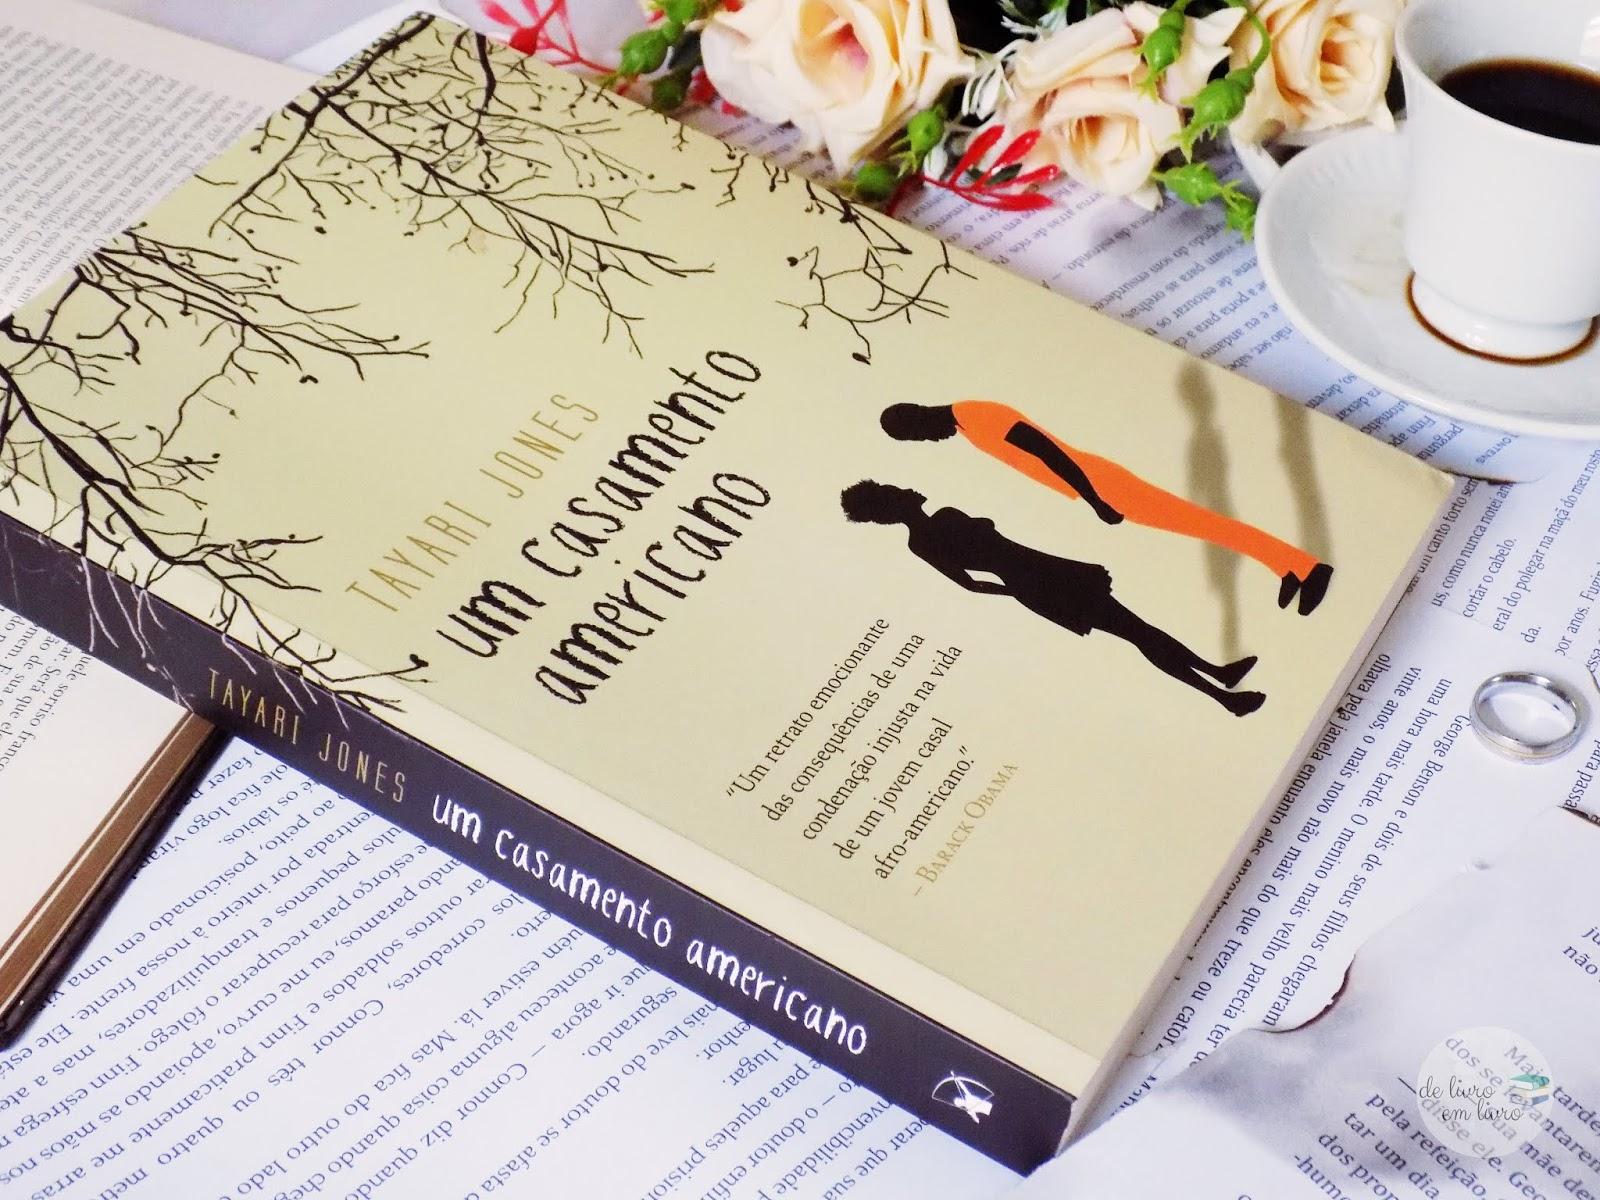 Um Casamento Americano - Tayari Jones